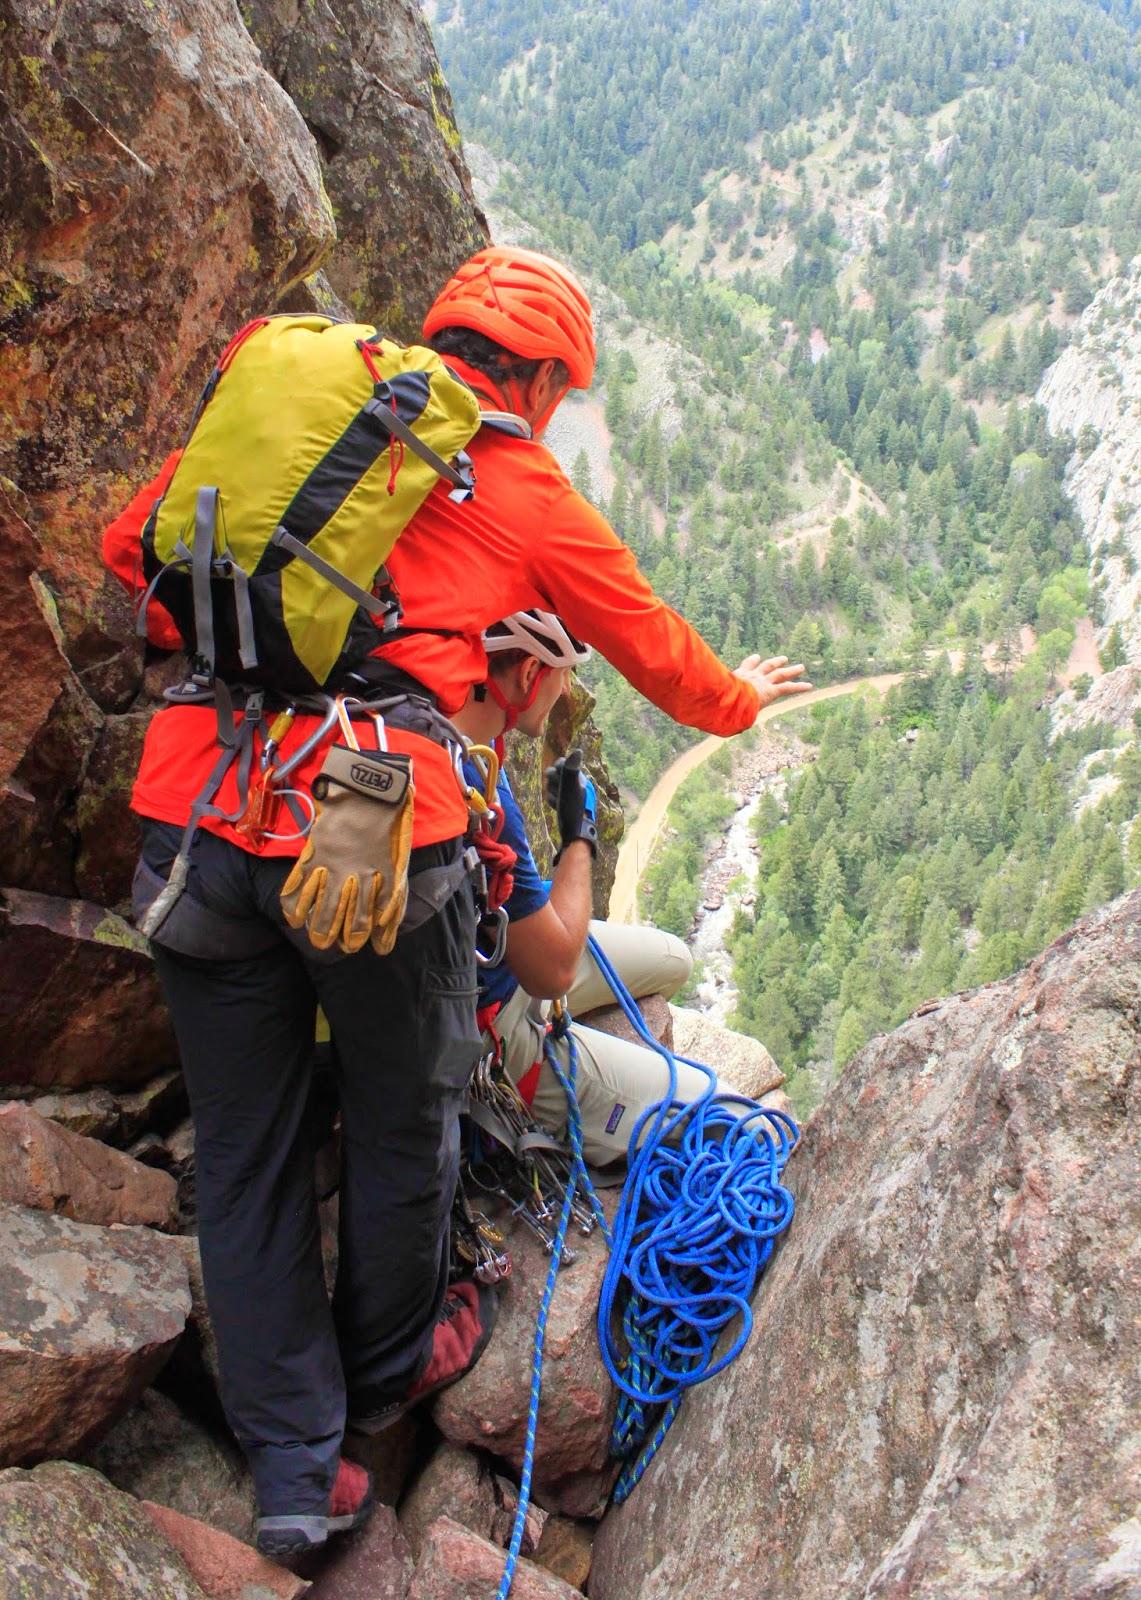 amga alpine guide course andy hansen rh andrewjameshansen blogspot com Montana Alpine Guides Pacific Alpine Guides